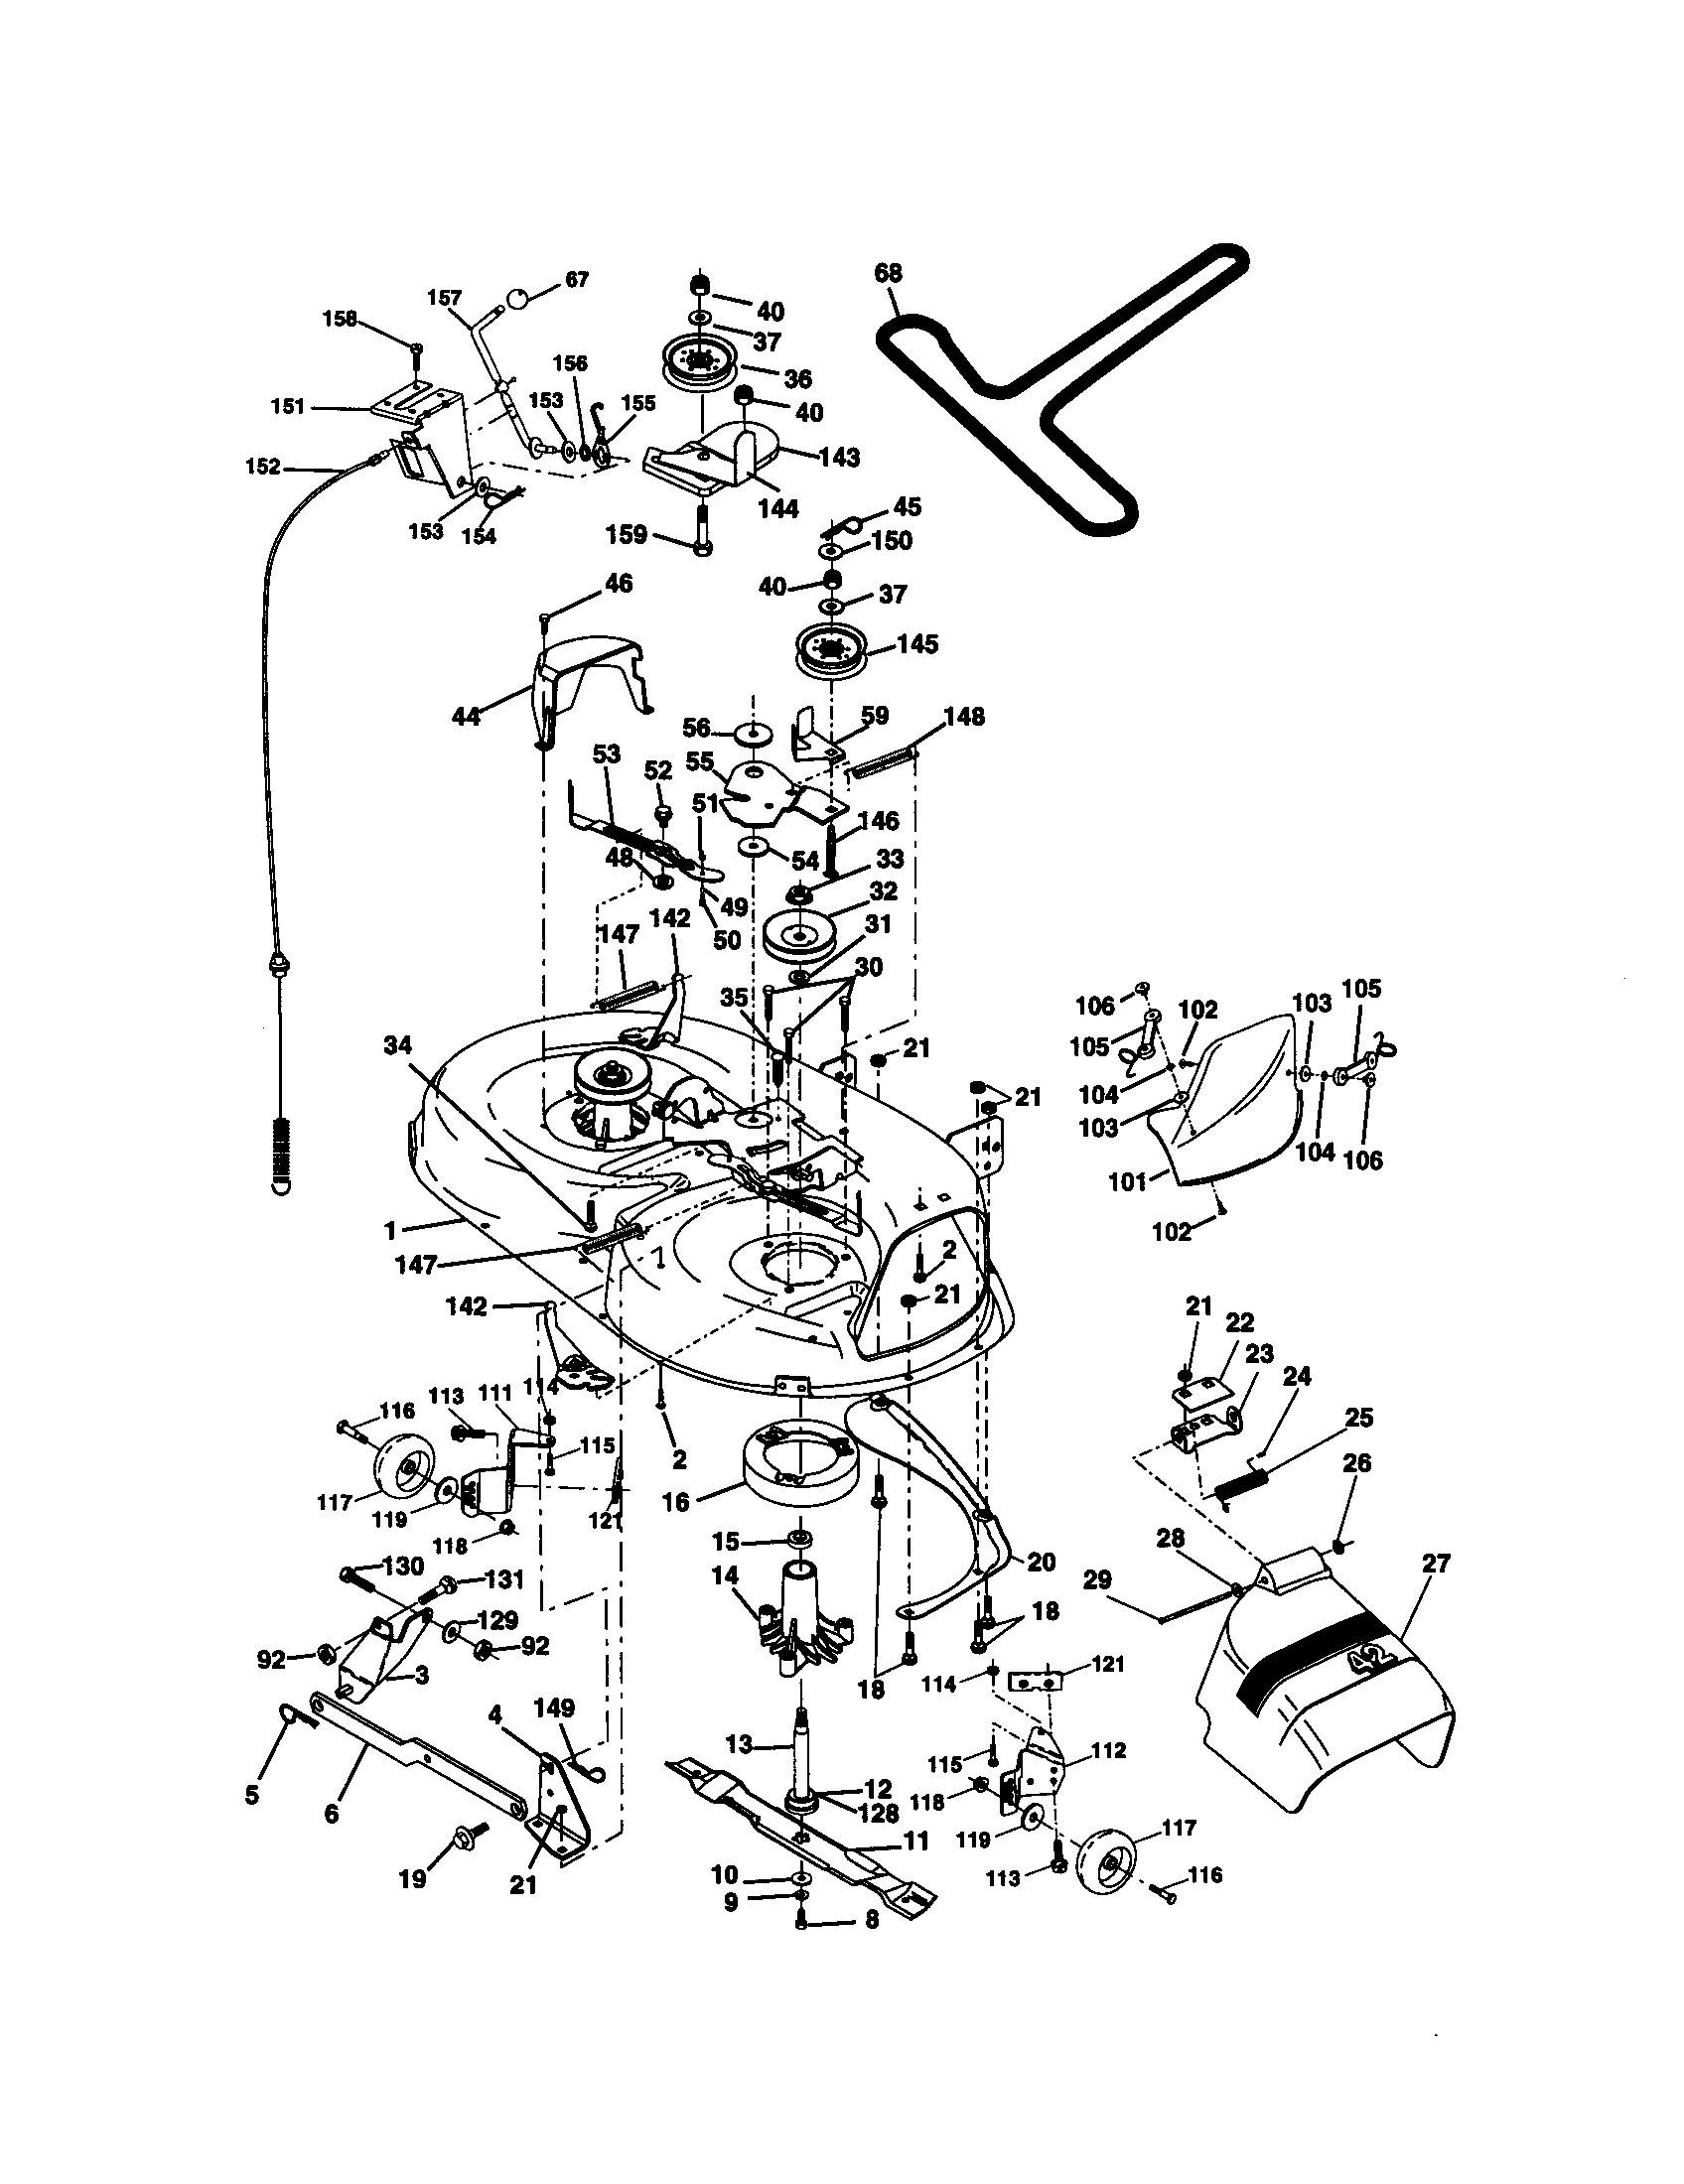 briggs and stratton 17 5 hp engine parts diagram briggs stratton engine  diagram 2 craftsman model